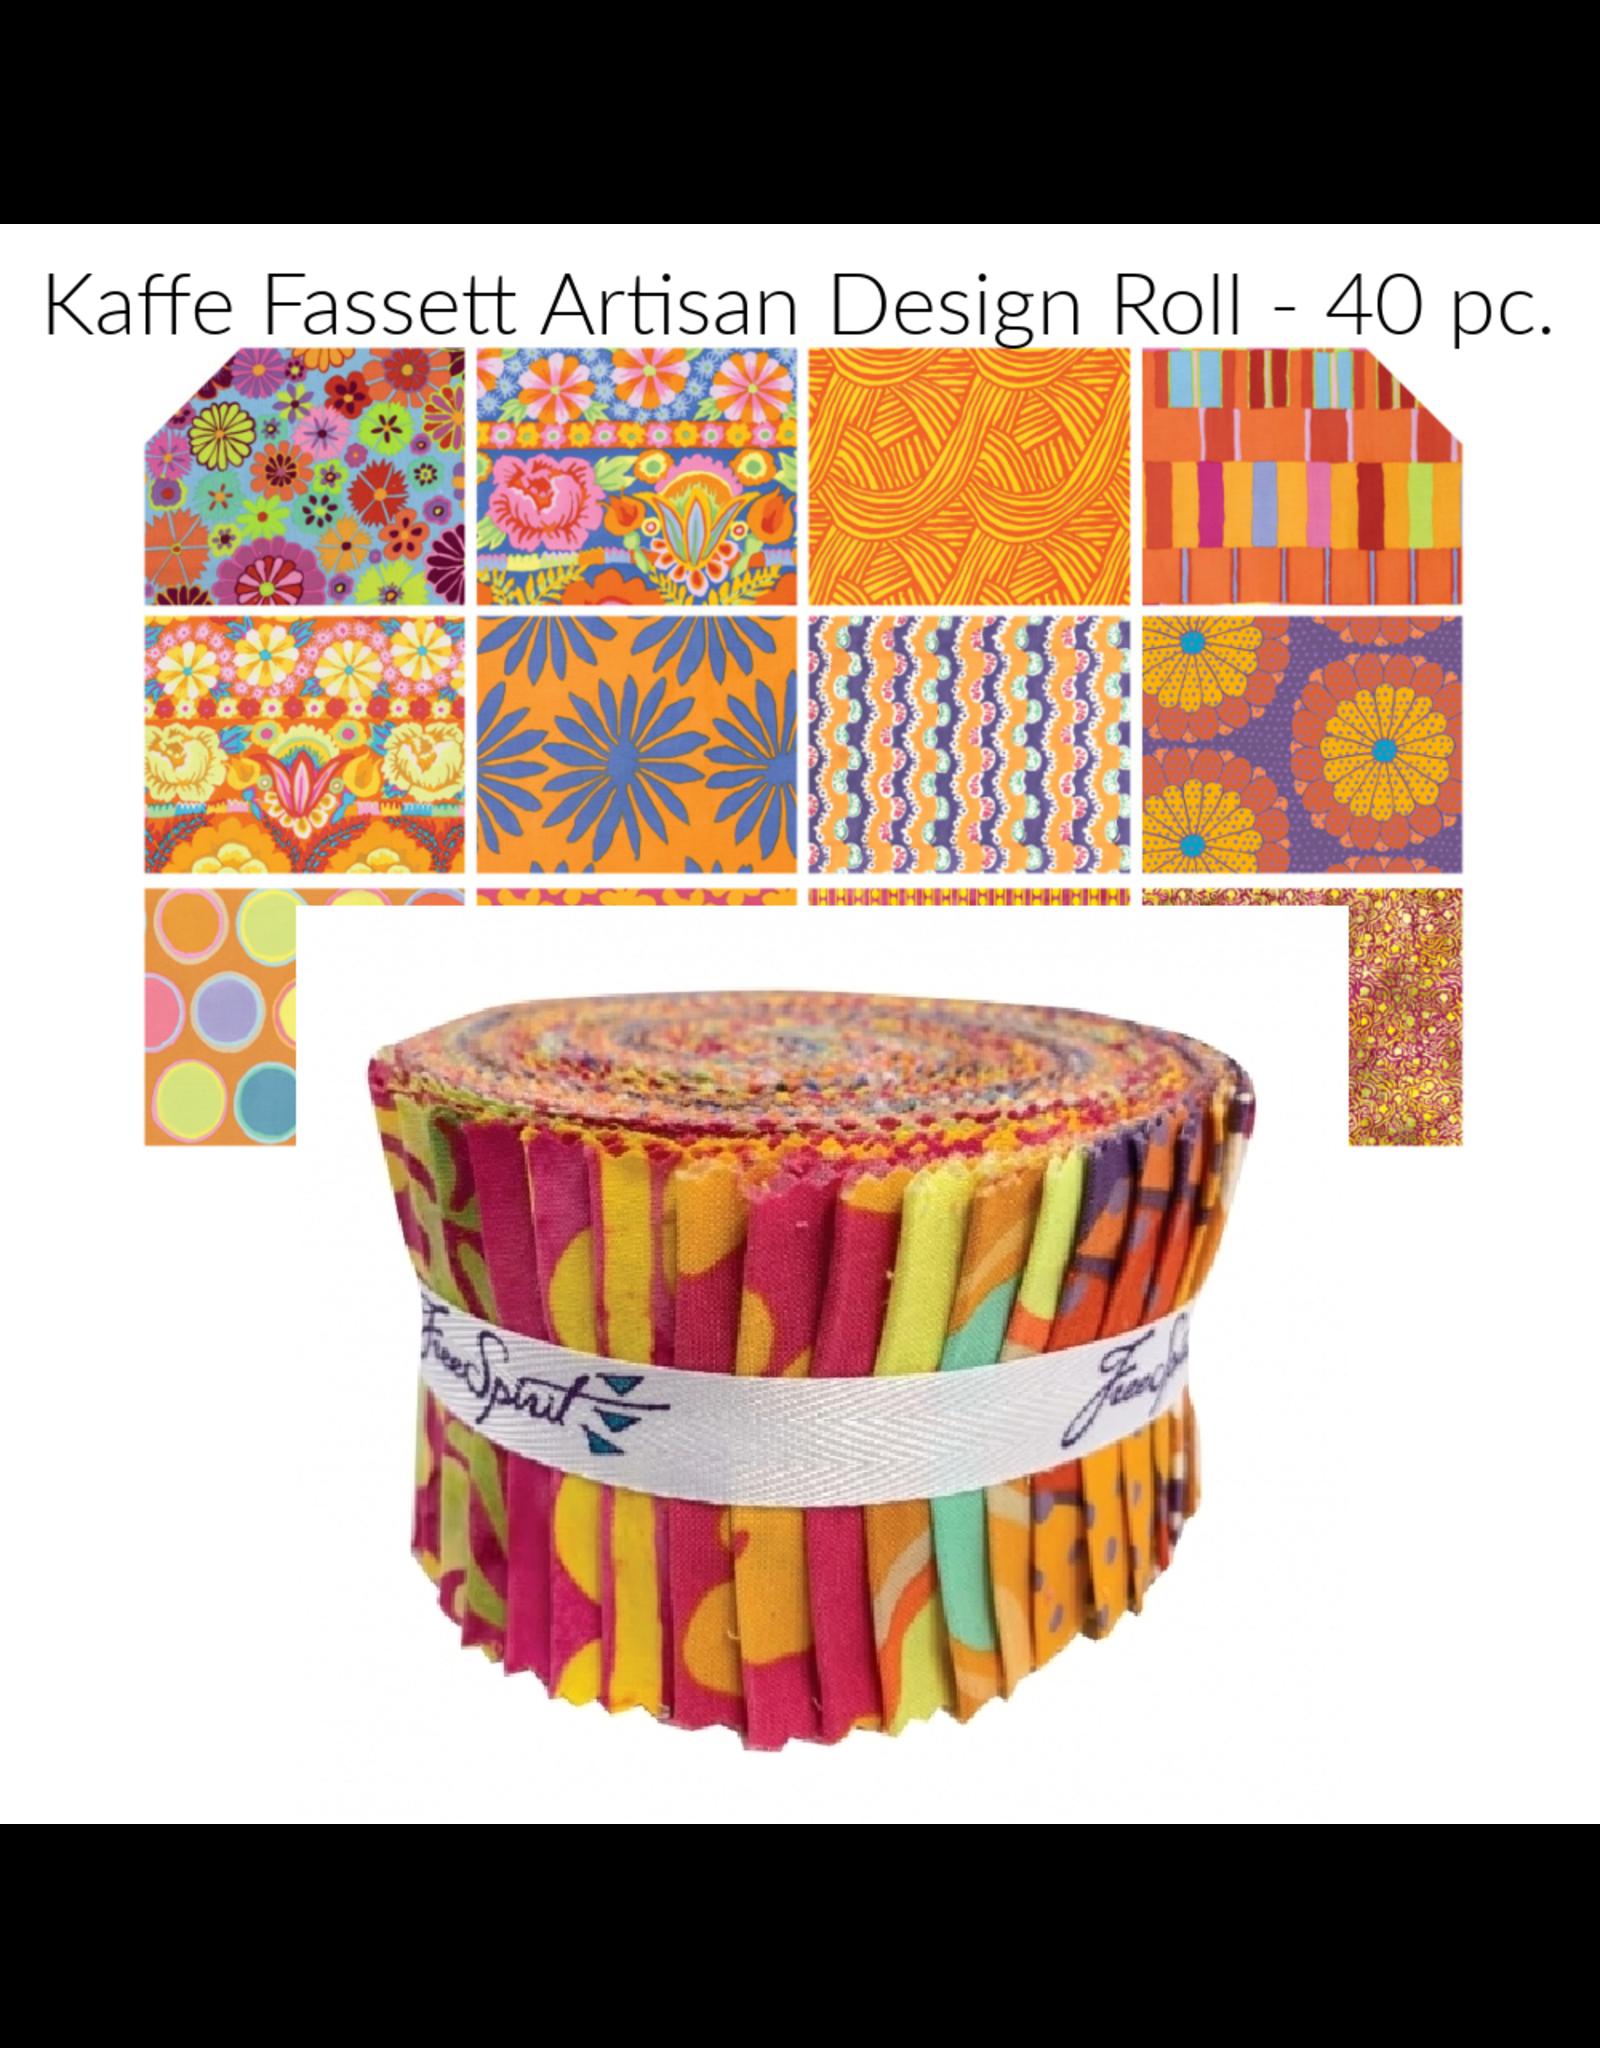 Kaffe Fassett Artisan Soprano by Kaffe Fassett, Jelly Roll, 40 pc. Design Roll